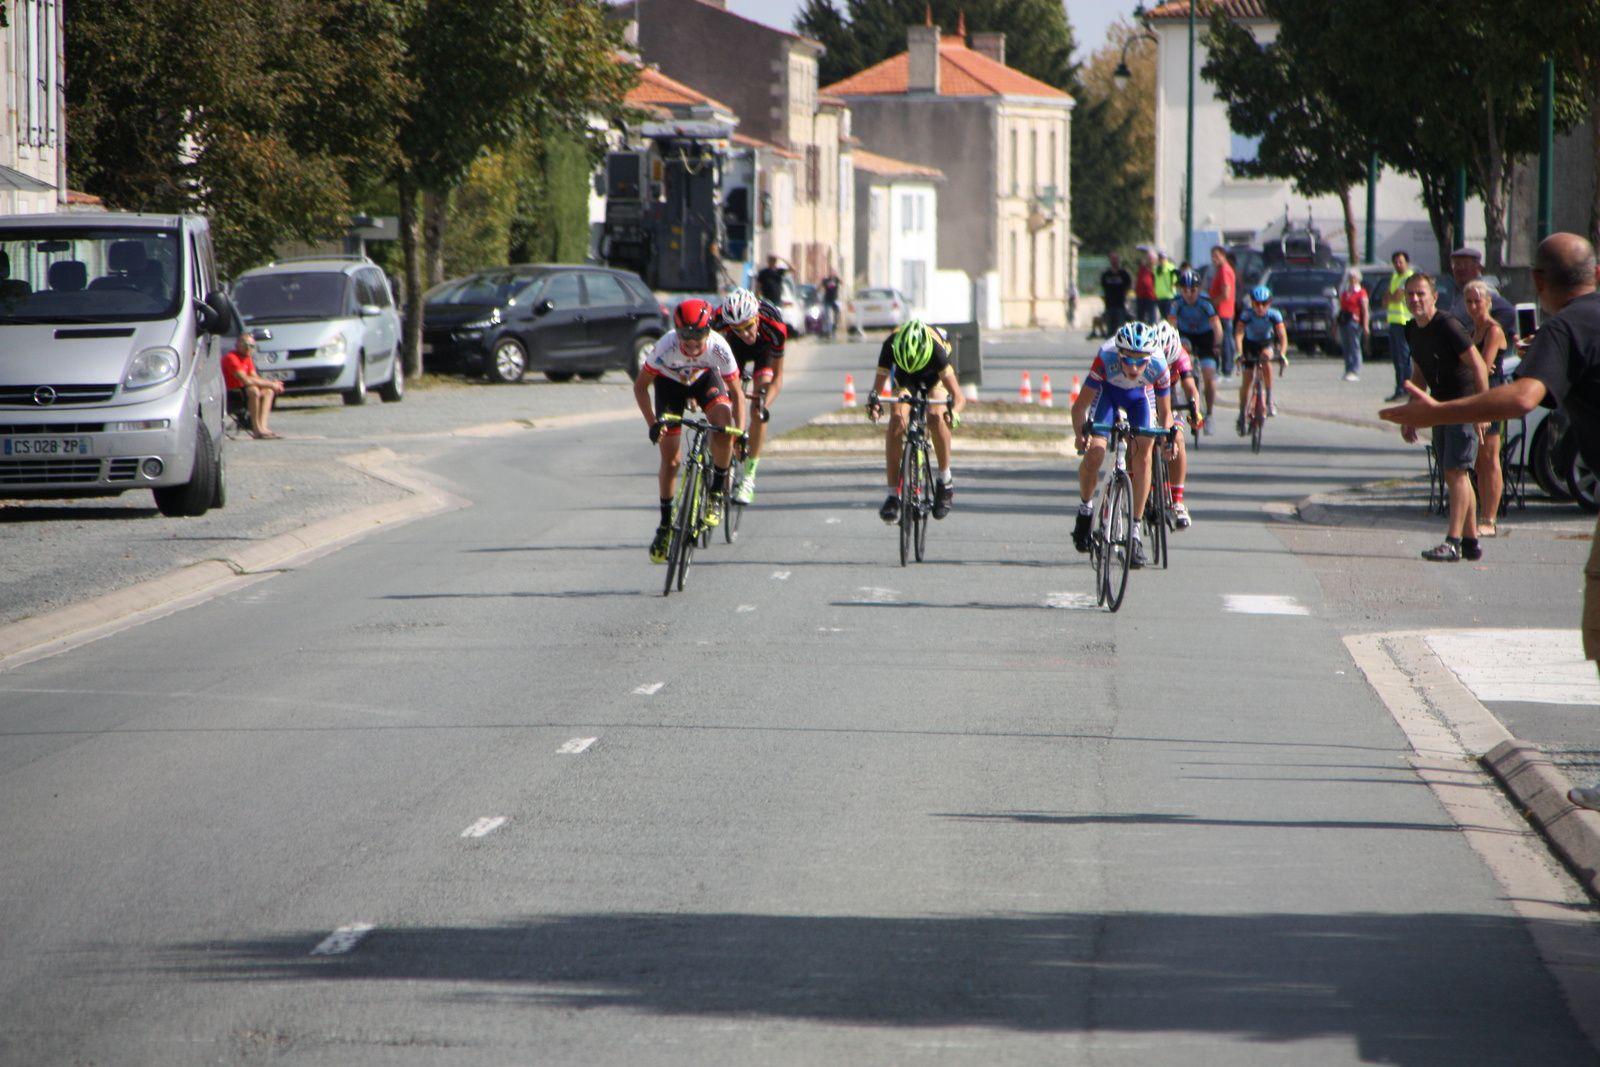 3e Louis  LEPECULIER (CA  Civray), 4e Victor HUCTEAU(AC 4B), 5e  Quentin  CLISSON(Angouléme  VC), 6e  Julien  BENOIT(VC  Rochefort), 7e  Tomy  DRUTINUS(C  Poitevin)